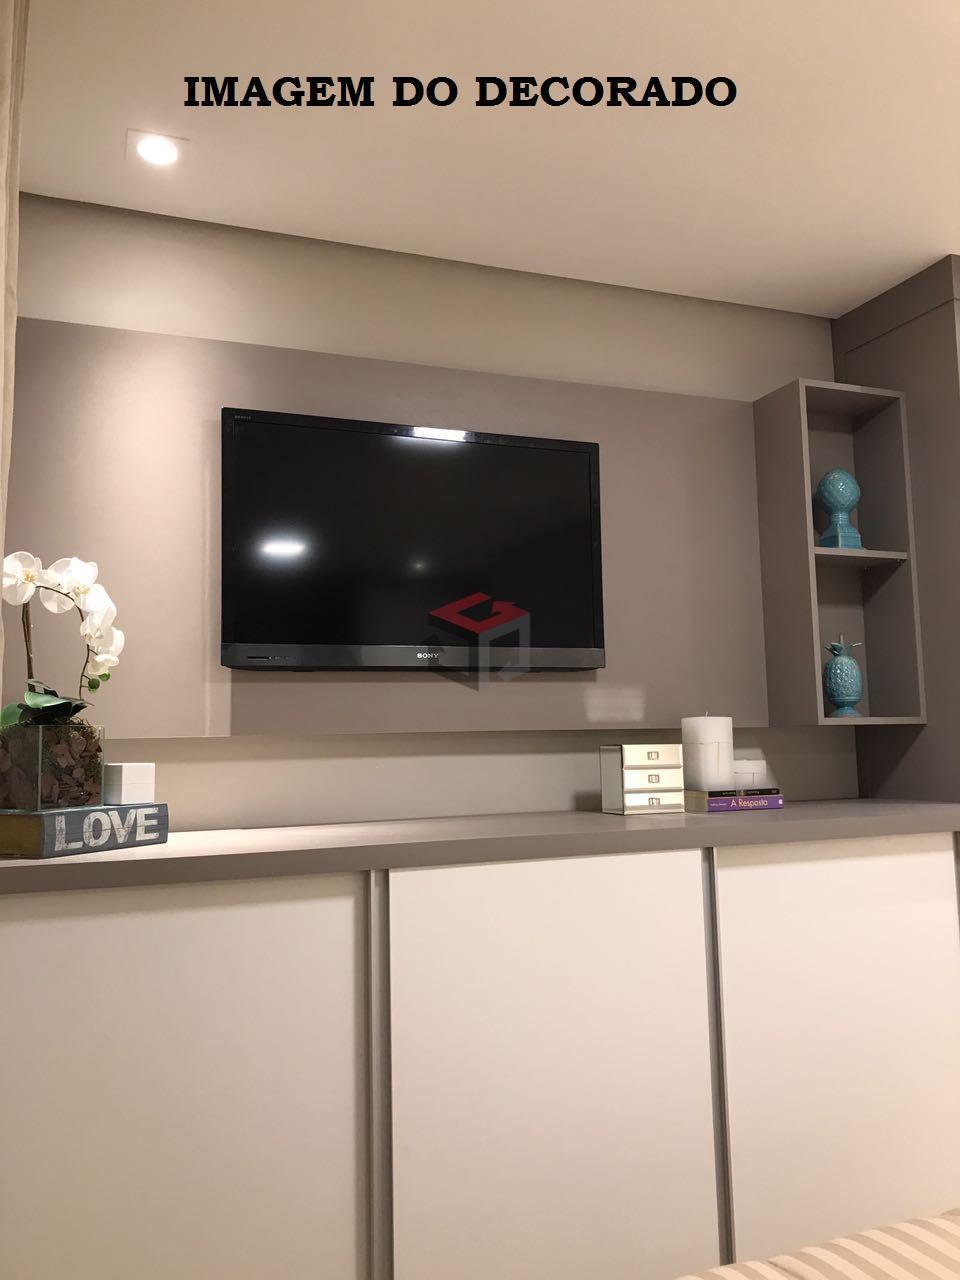 lançamento - centro - sbc 2 dormitórios, 1 suíte, sala 2 ambientes, varanda gourmet, 2 vagas,...